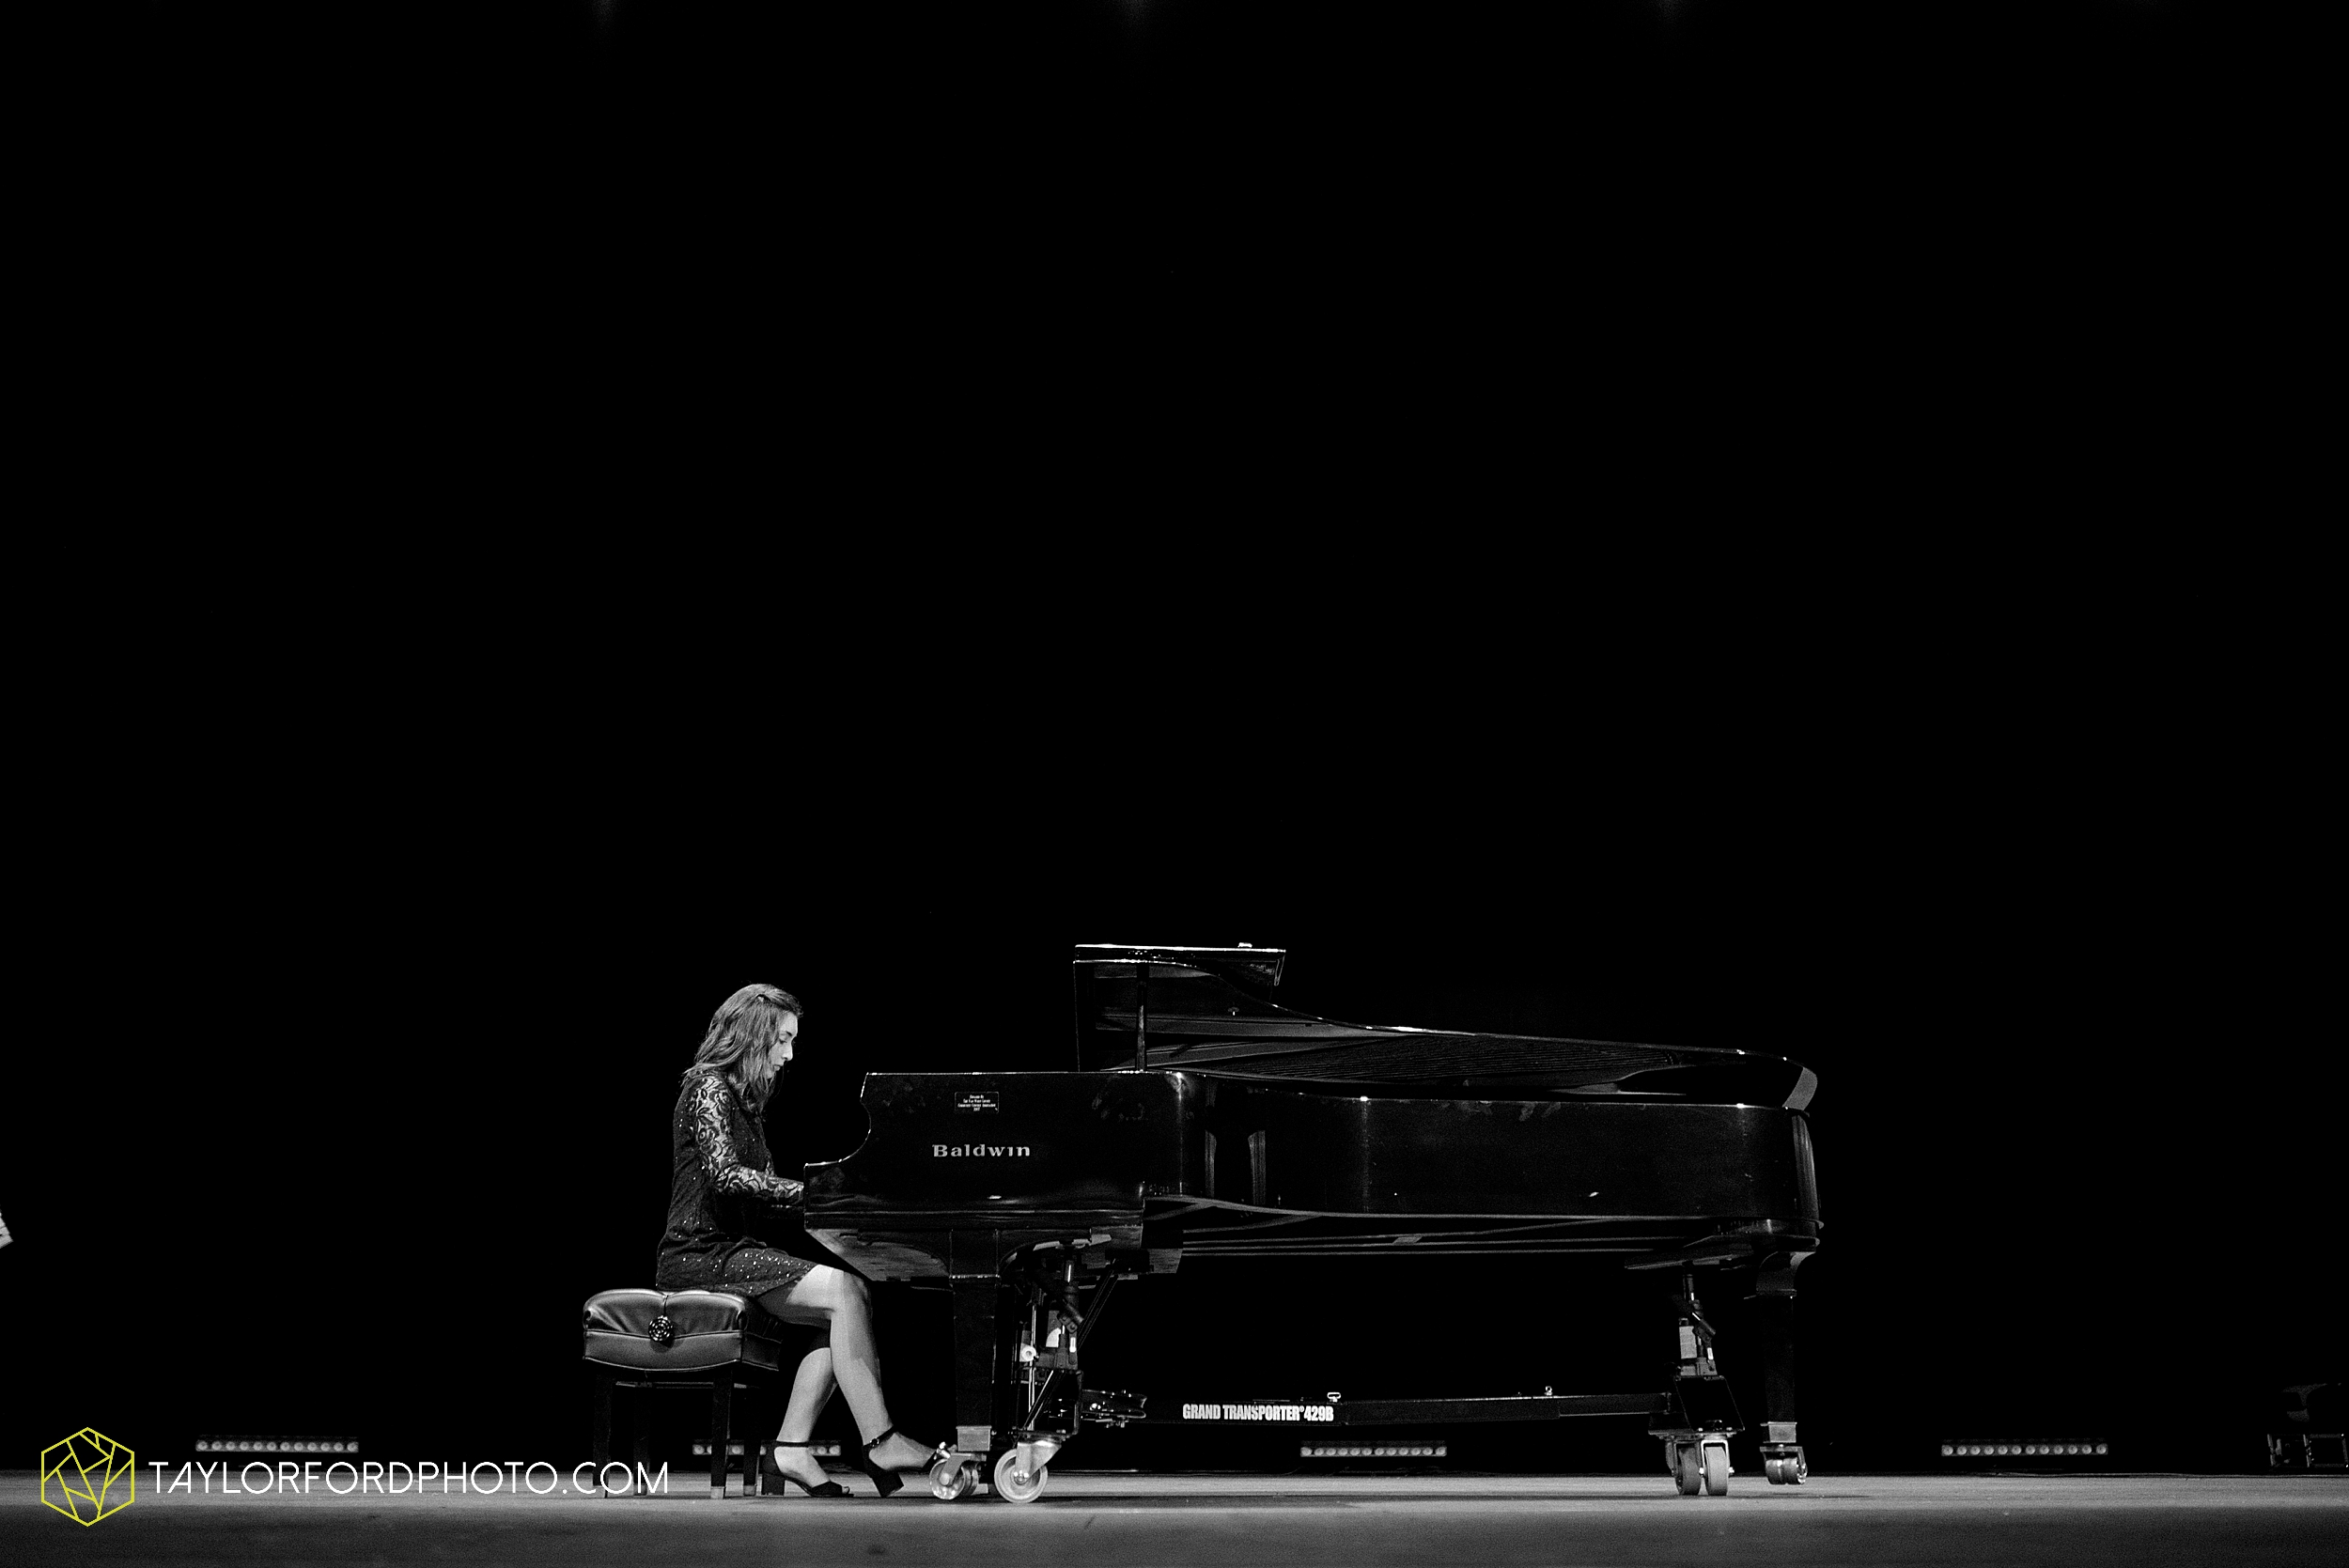 niswonger-performing-arts-center-senior-grand-piano-van-wert-ohio-photography-taylor-ford-hirschy-photographer_2110.jpg